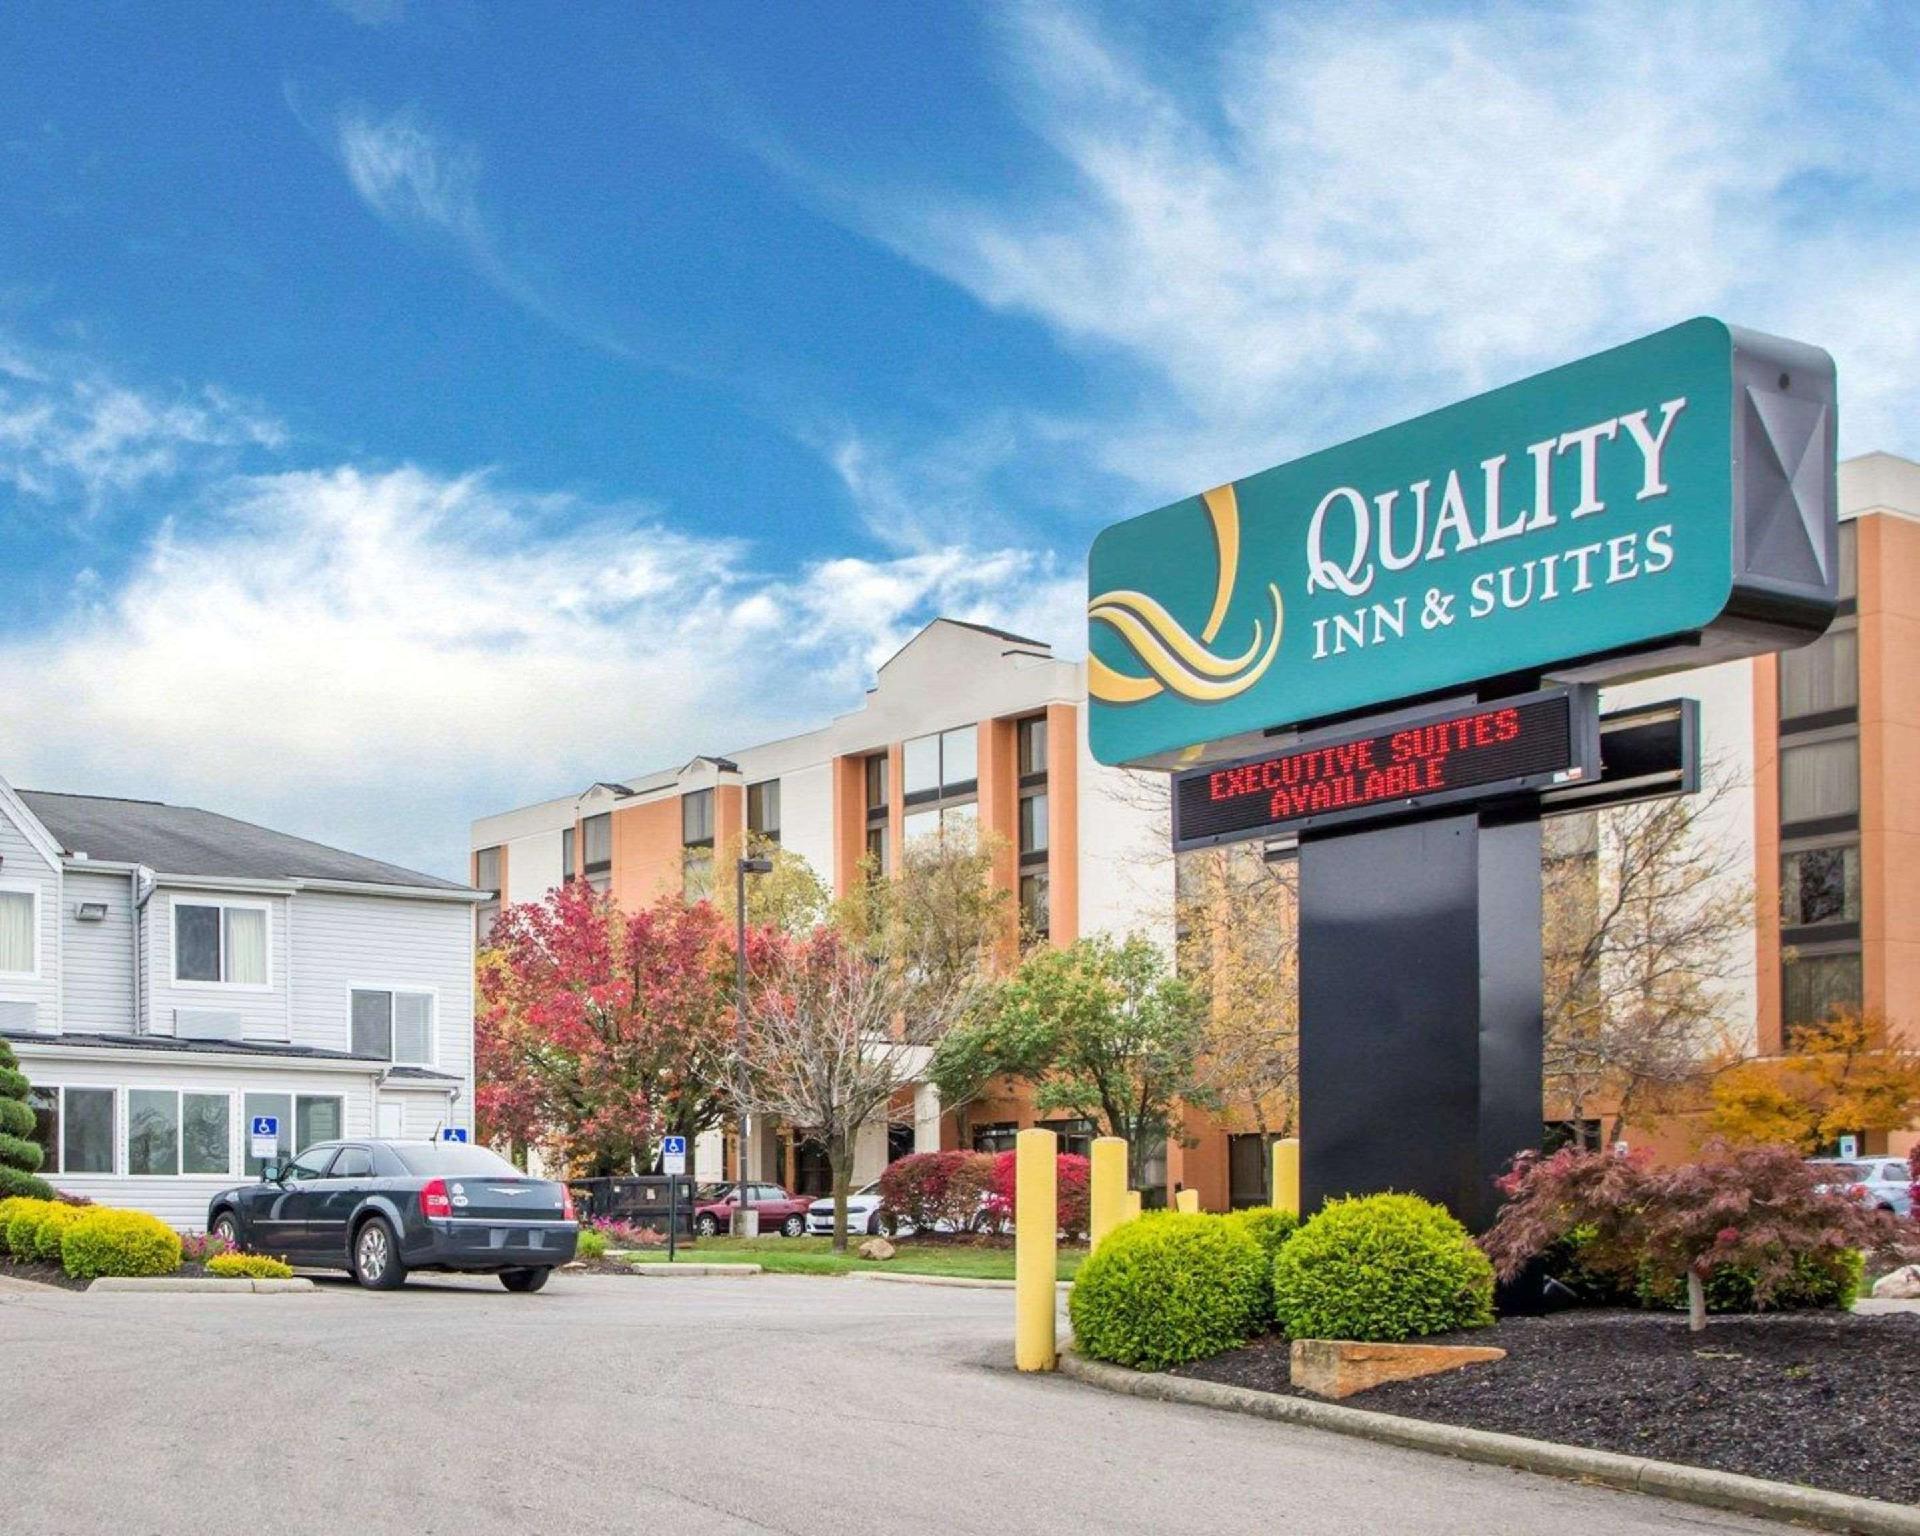 Quality Inn And Suites North Polaris